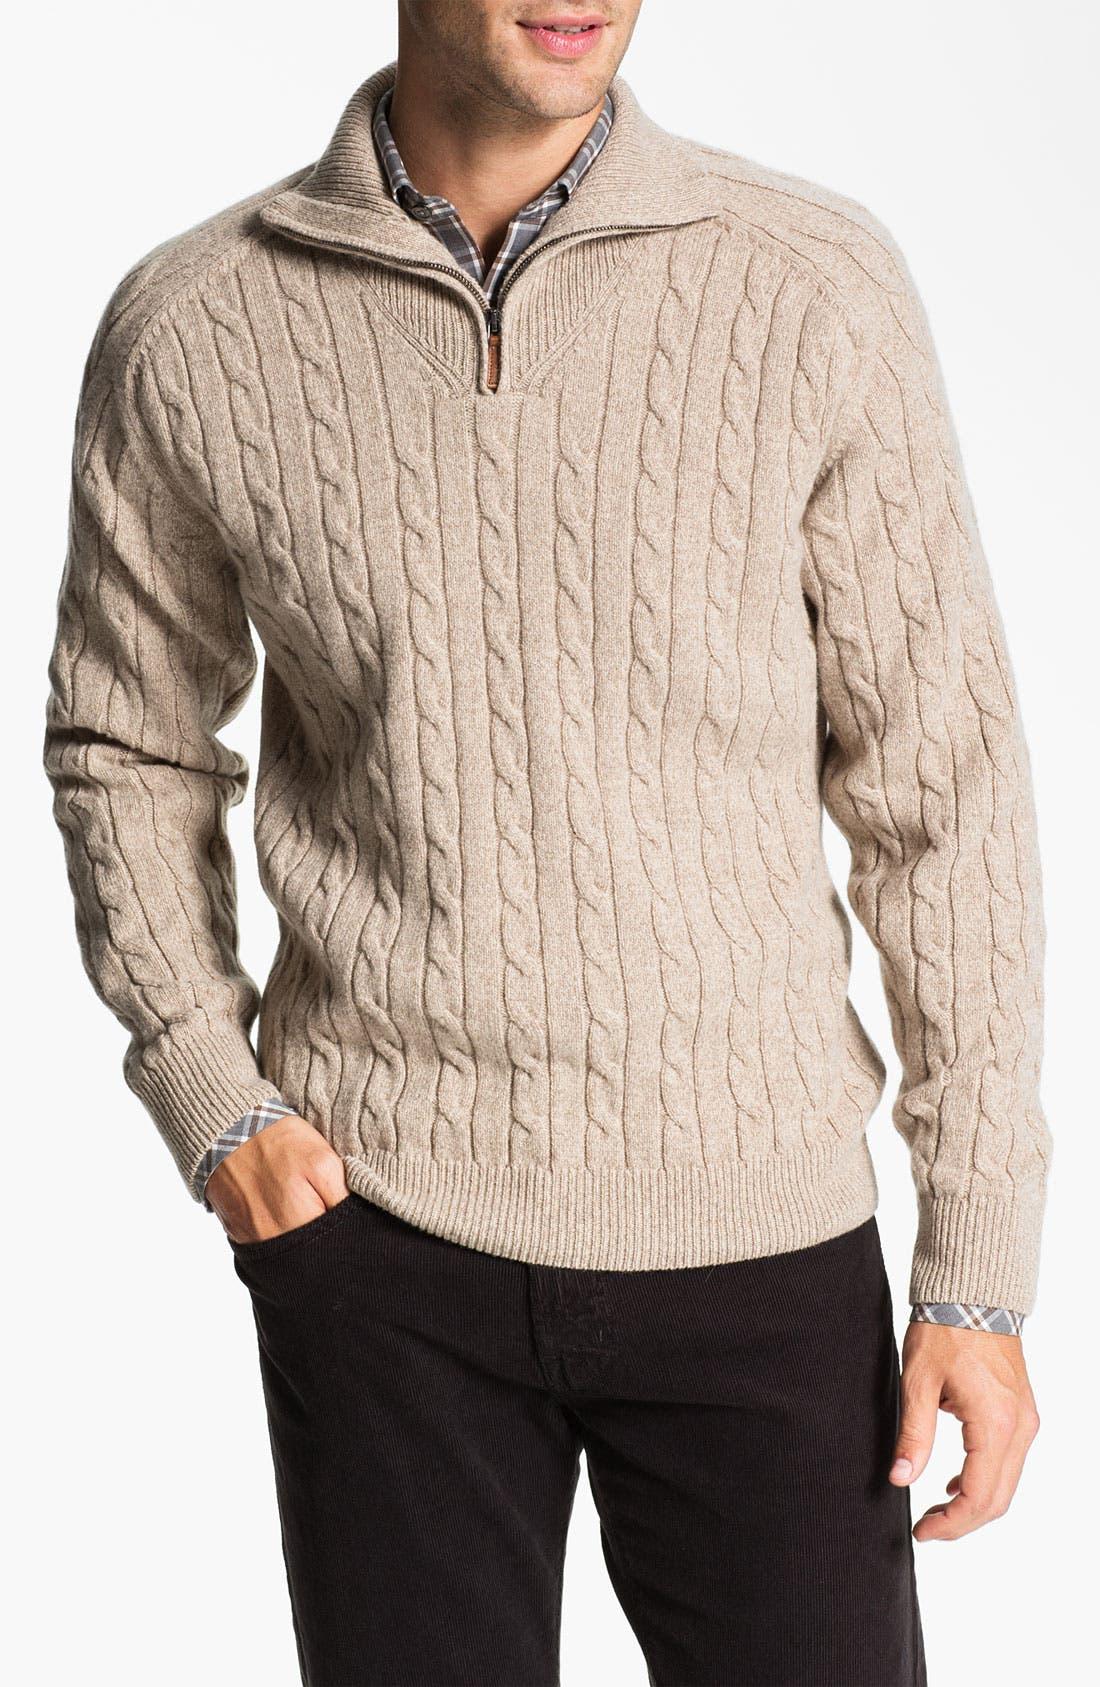 Alternate Image 1 Selected - Lora Gi Half Zip Wool & Cashmere Sweater